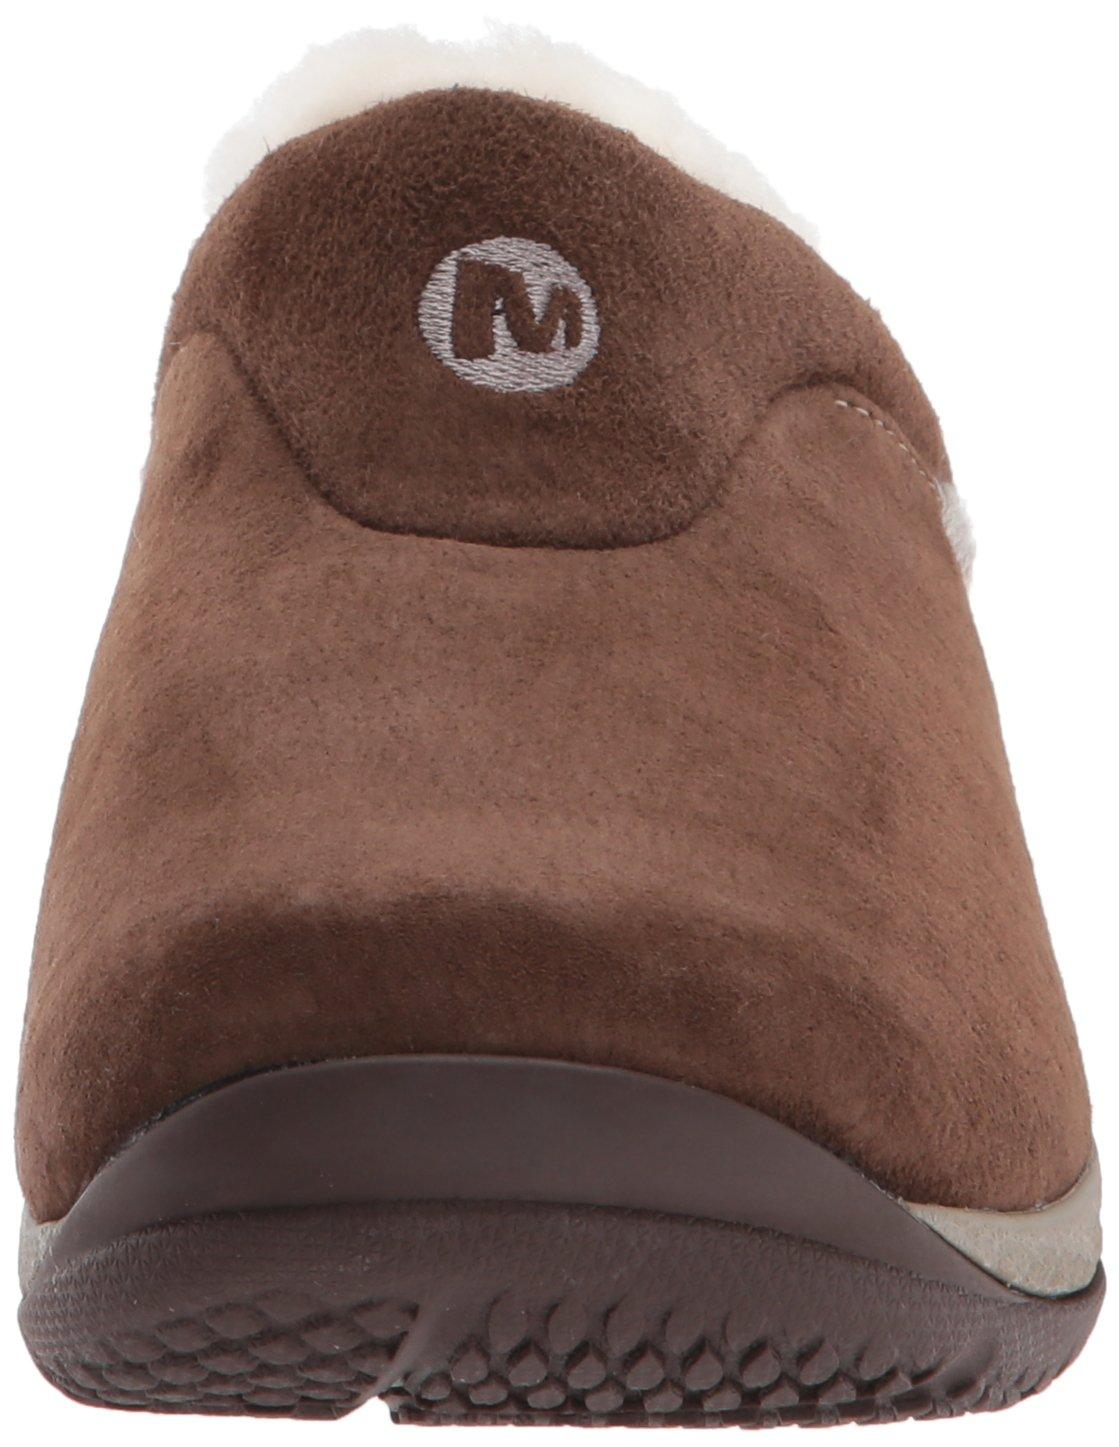 Merrell Women's Encore Q2 Ice Fashion Sneaker B01NAK1OP1 5.5 B(M) US Merrell Stone